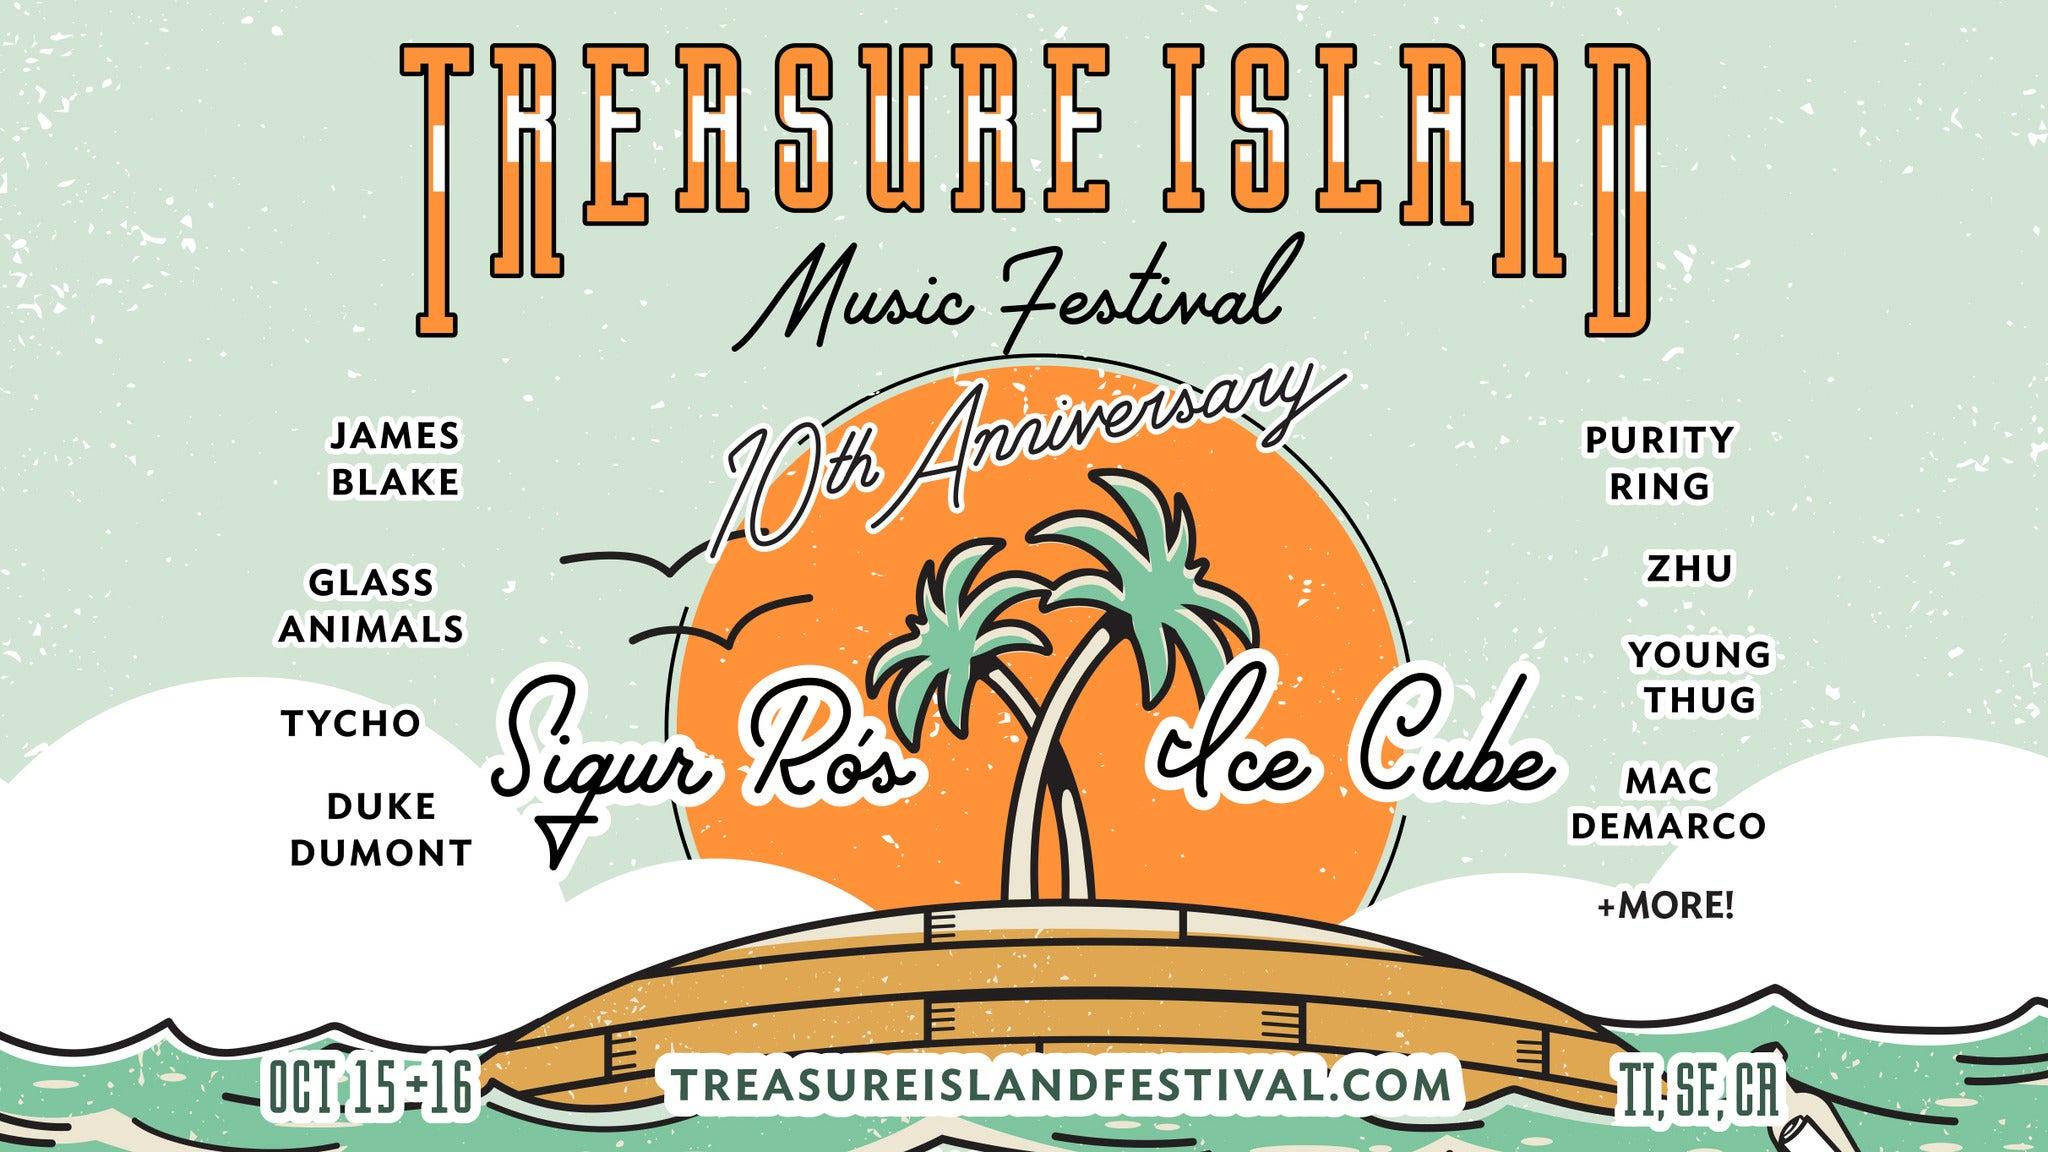 Treasure Island Music Festival - 2DAY GA Ticket